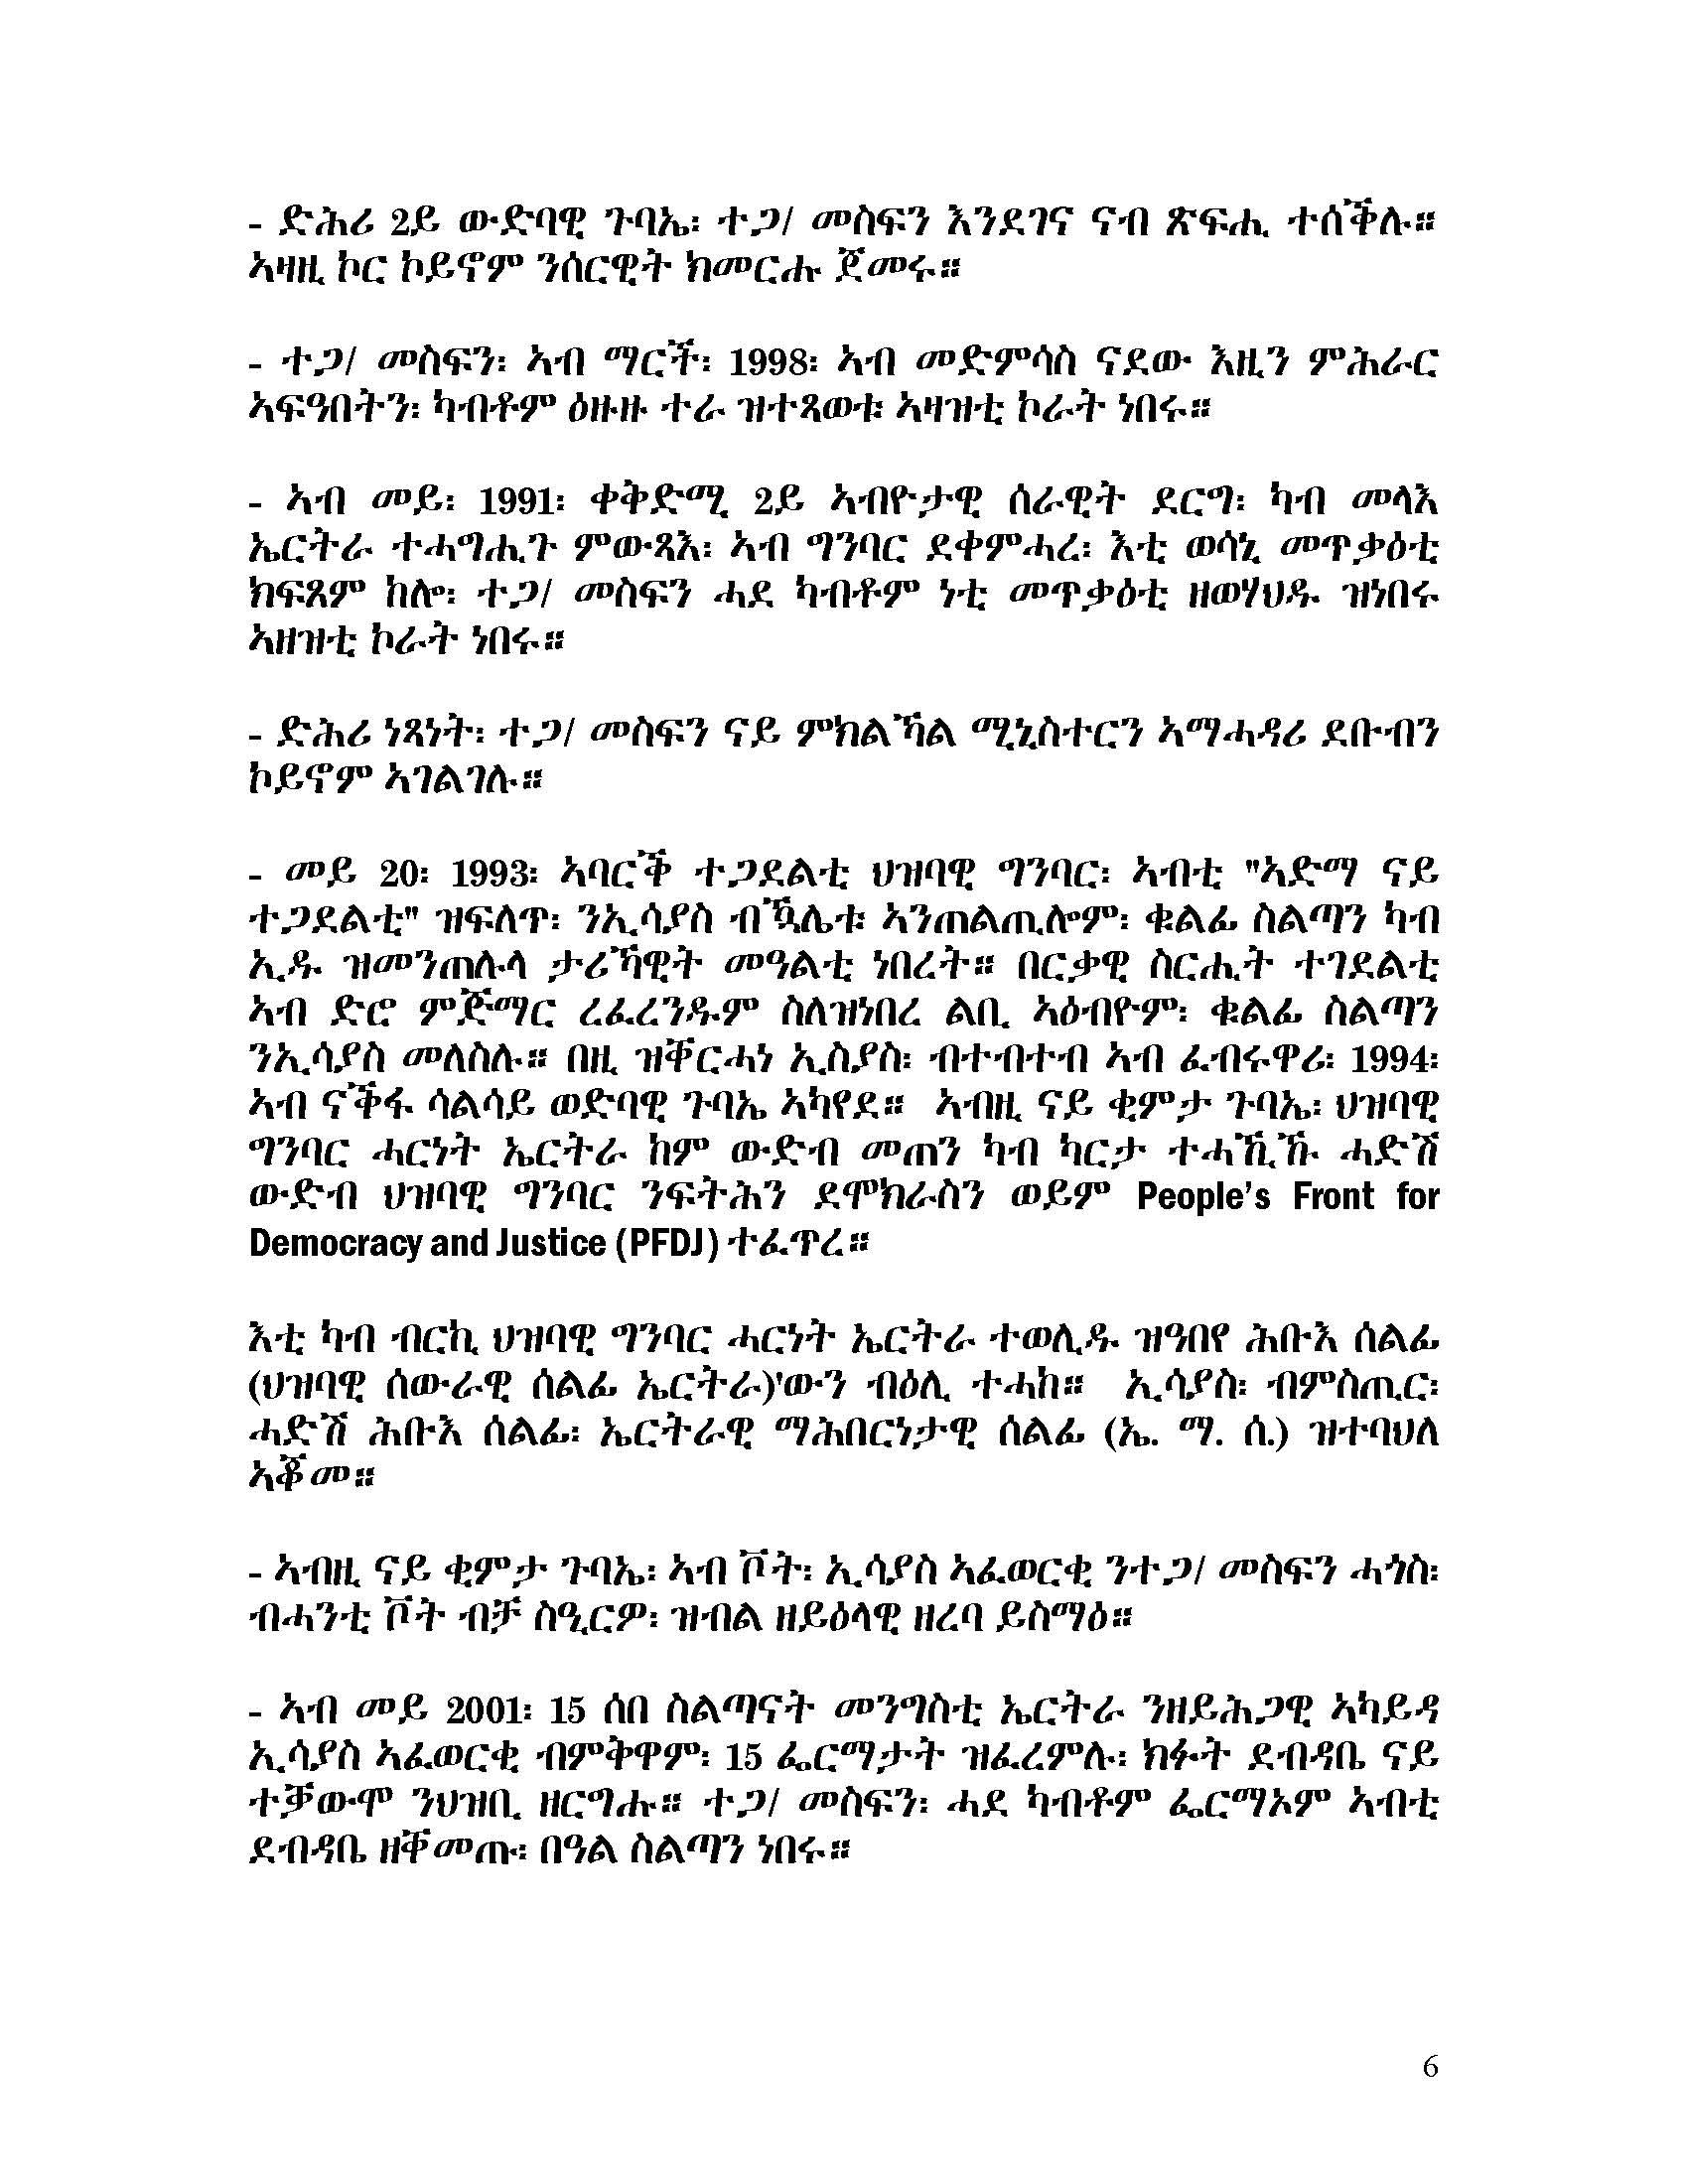 mesfun-fired-by-epdp-26nov20161_page_6